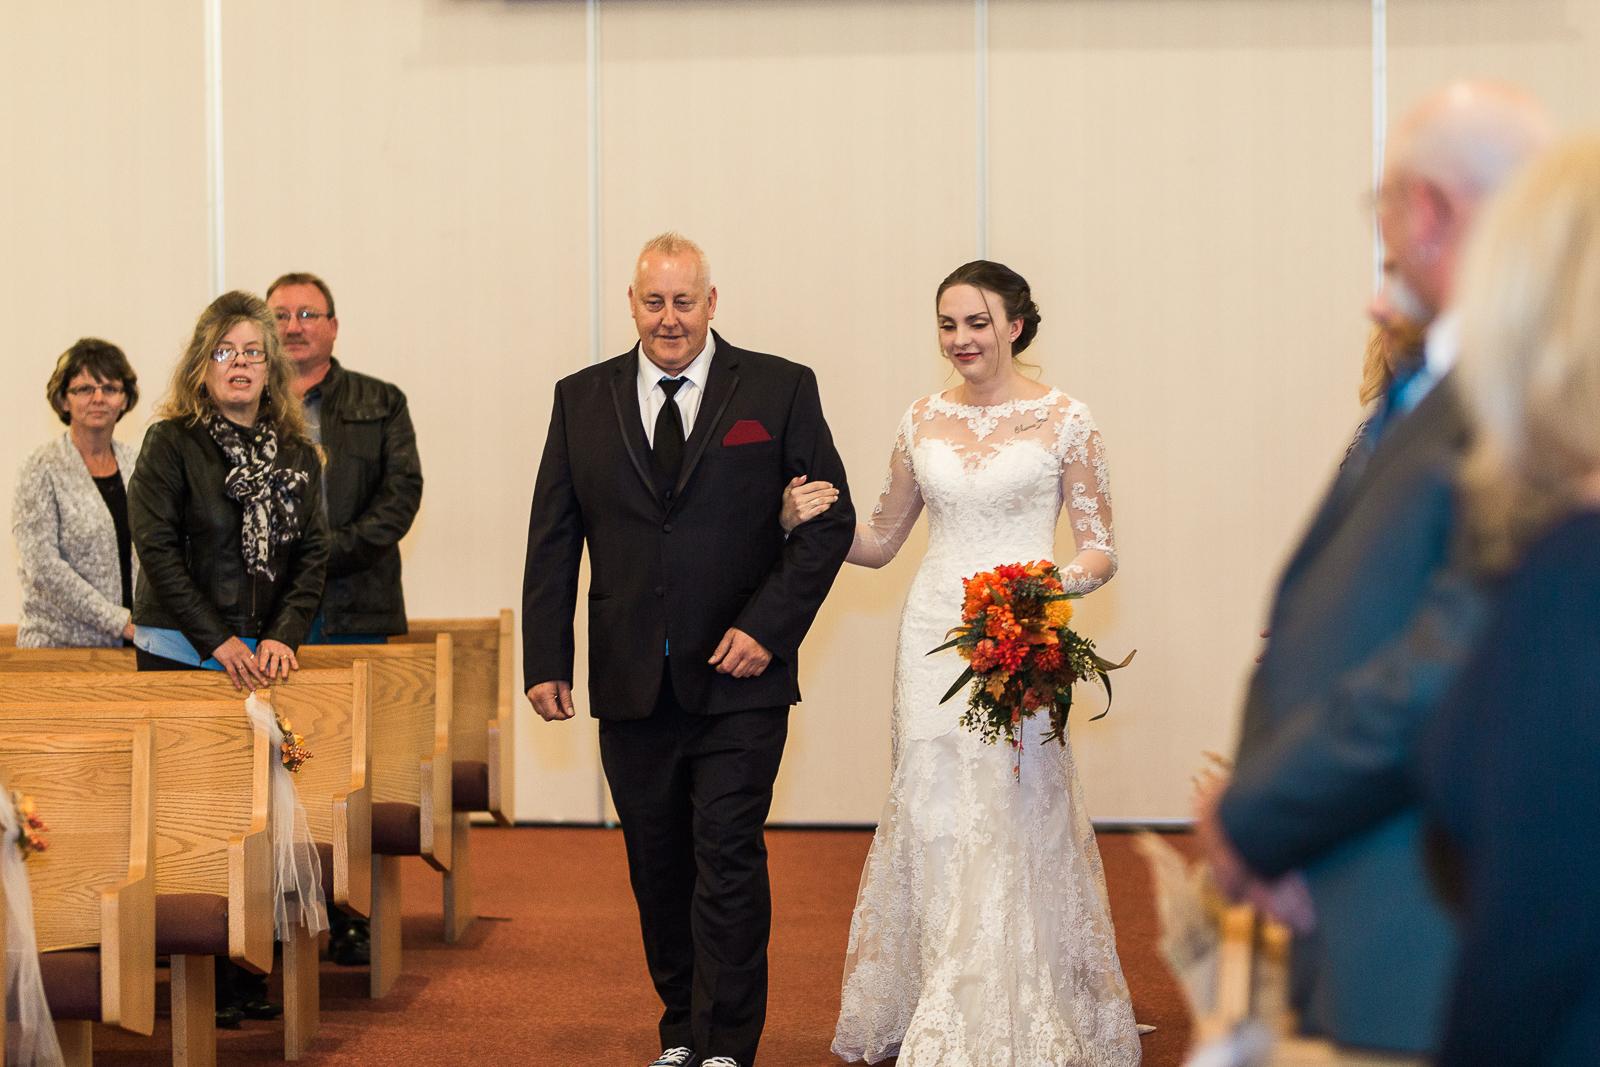 gander-wedding-photographer-43.jpg